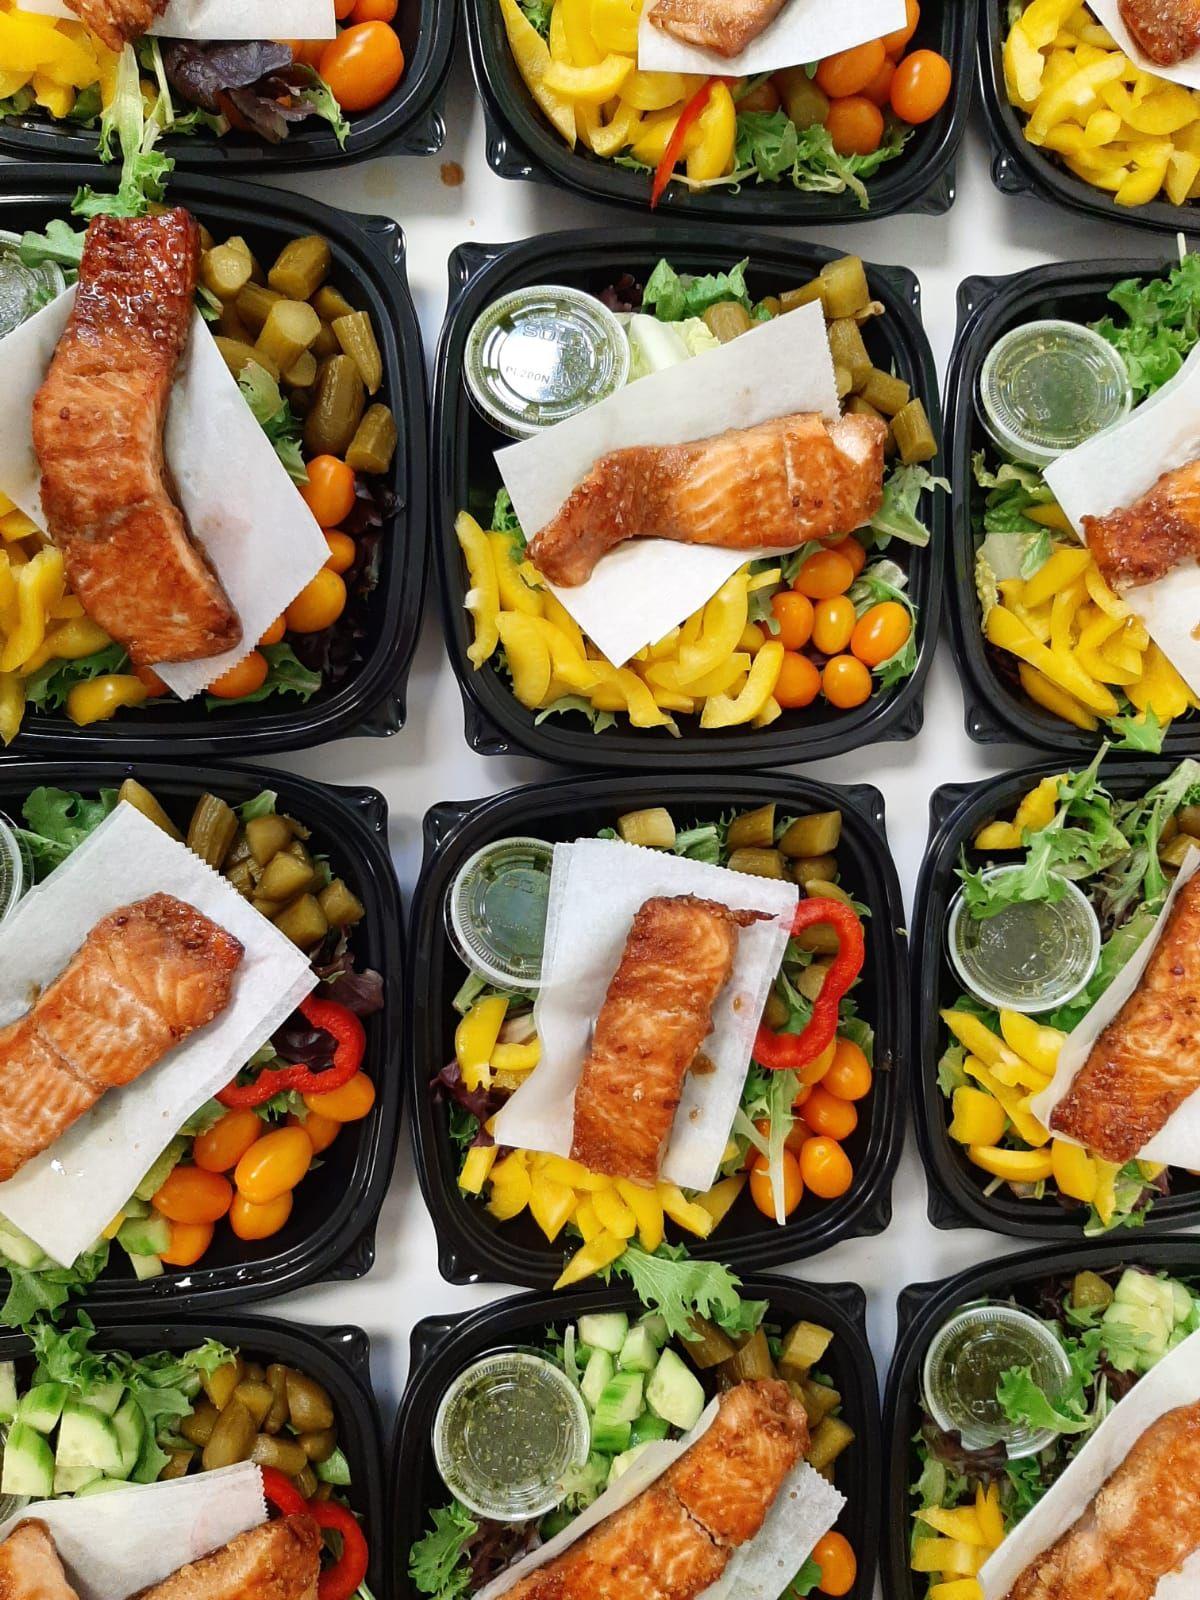 kosher meal diet plan delivery